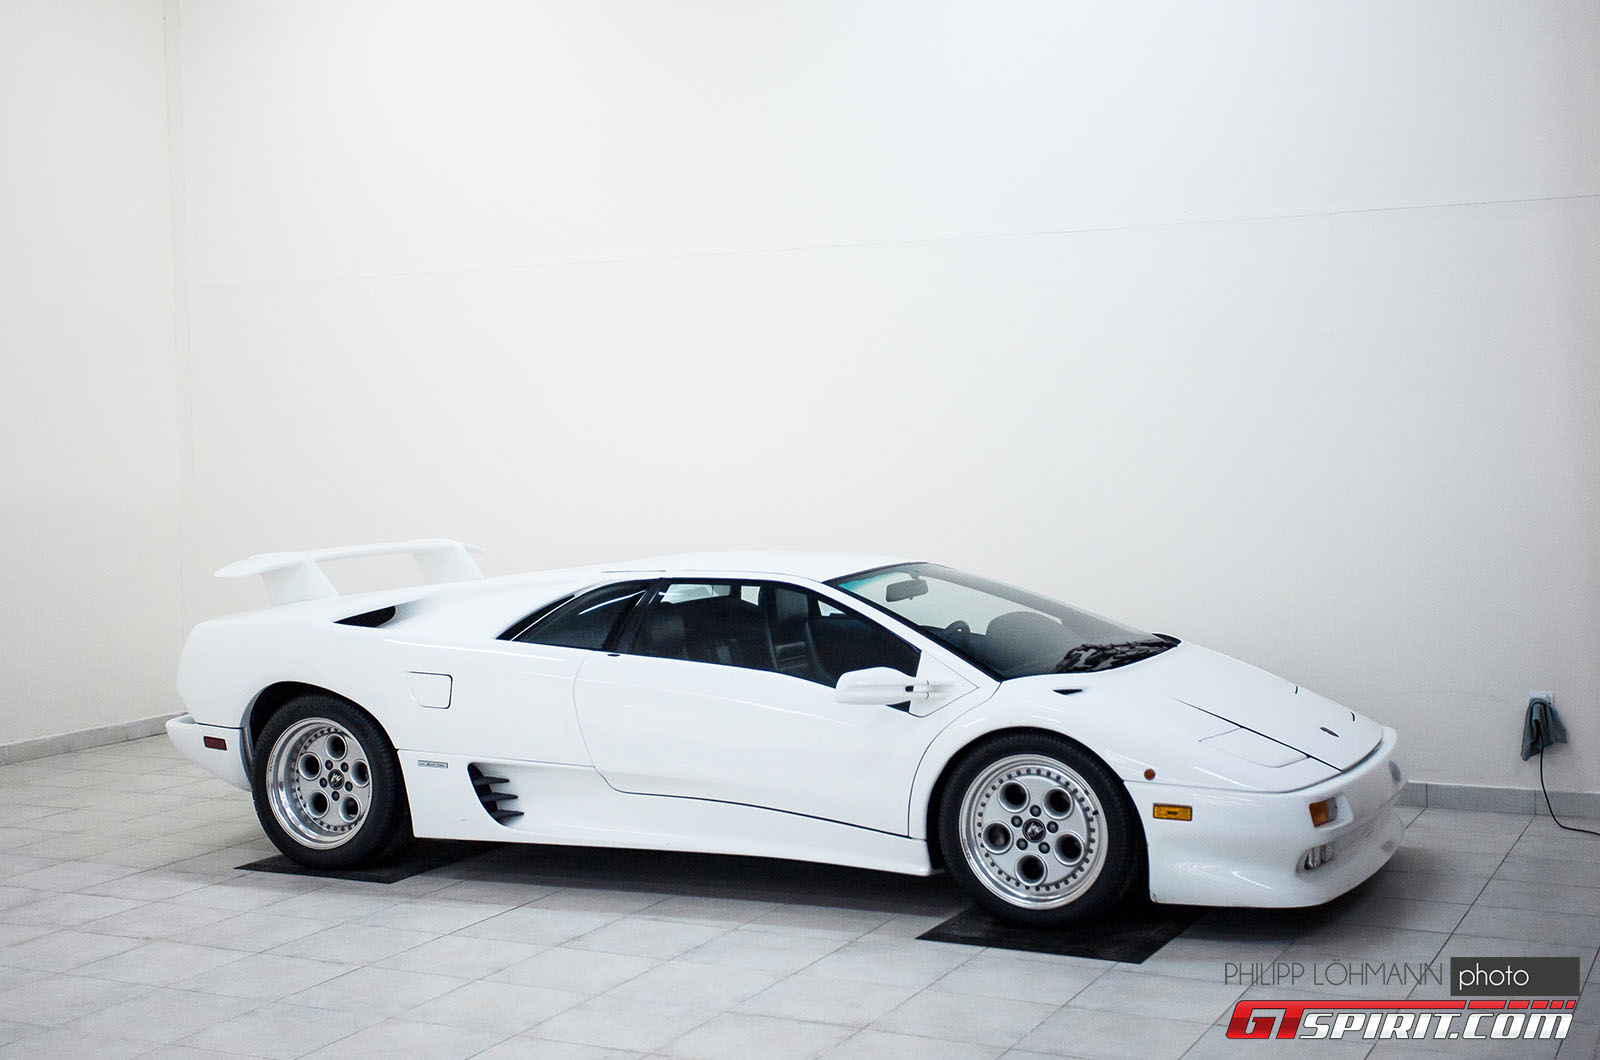 Гараж мечты в Абу-Даби. Lamborghini Diablo